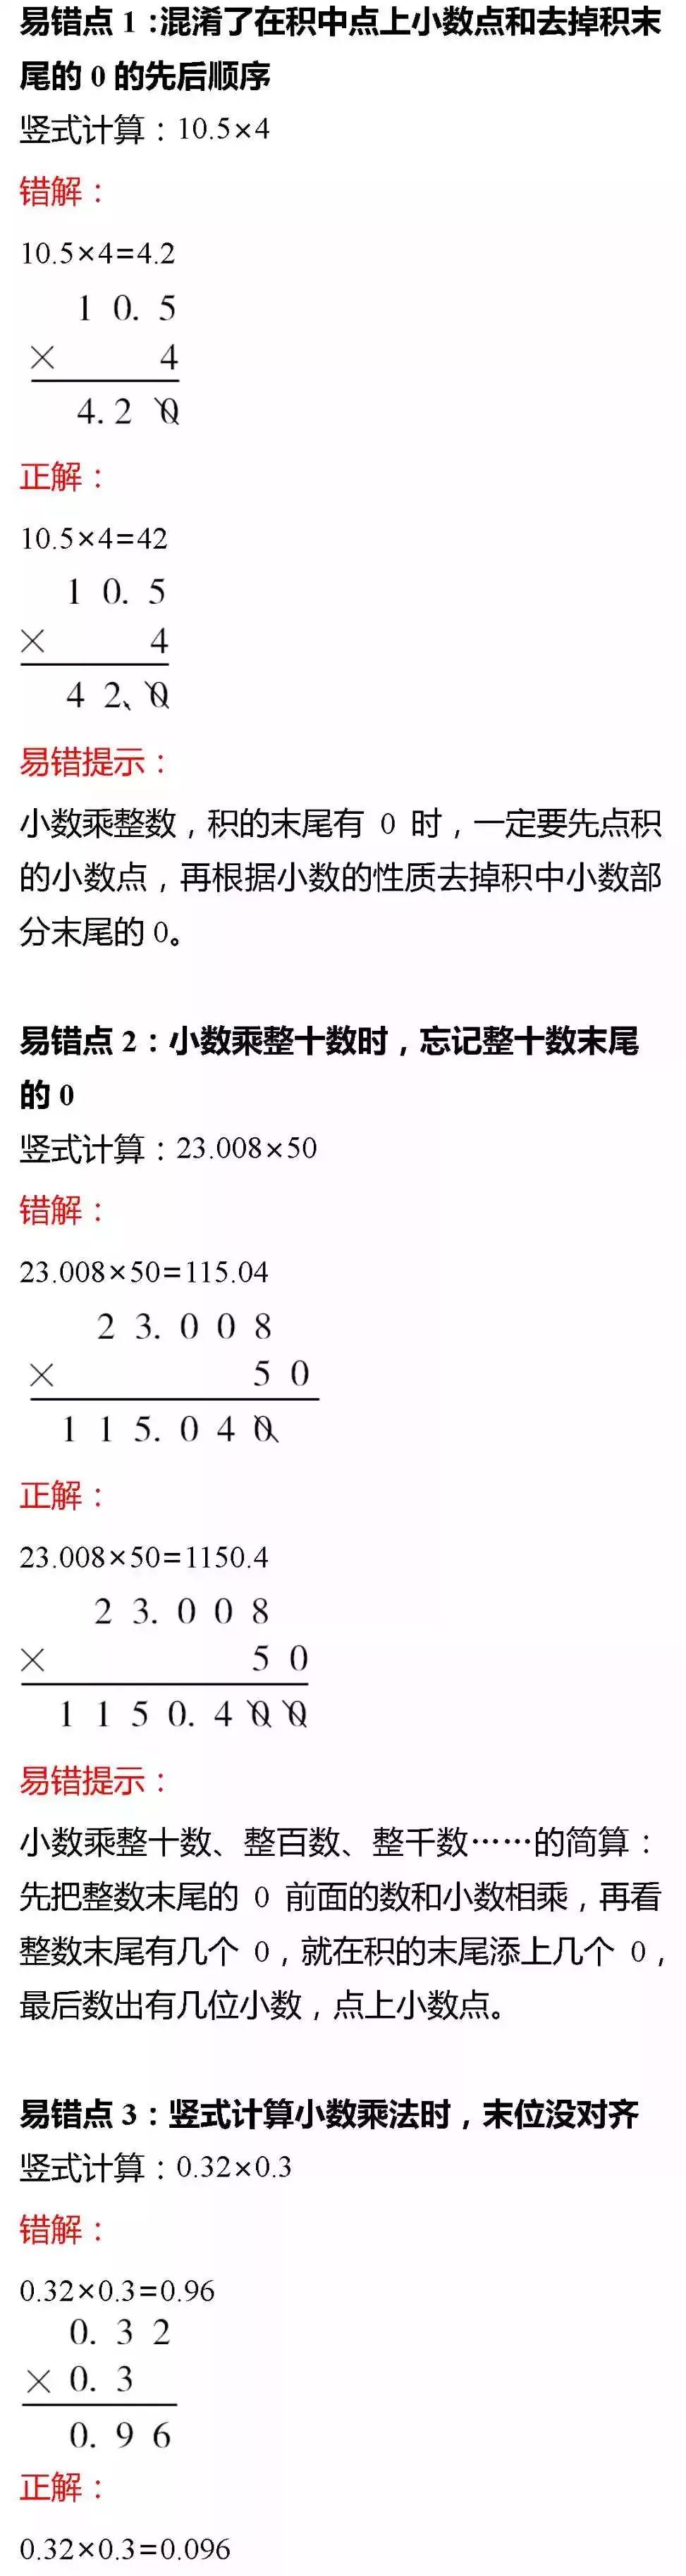 <b>5年级小学数学易错知识点,暑假考考孩子!</b>